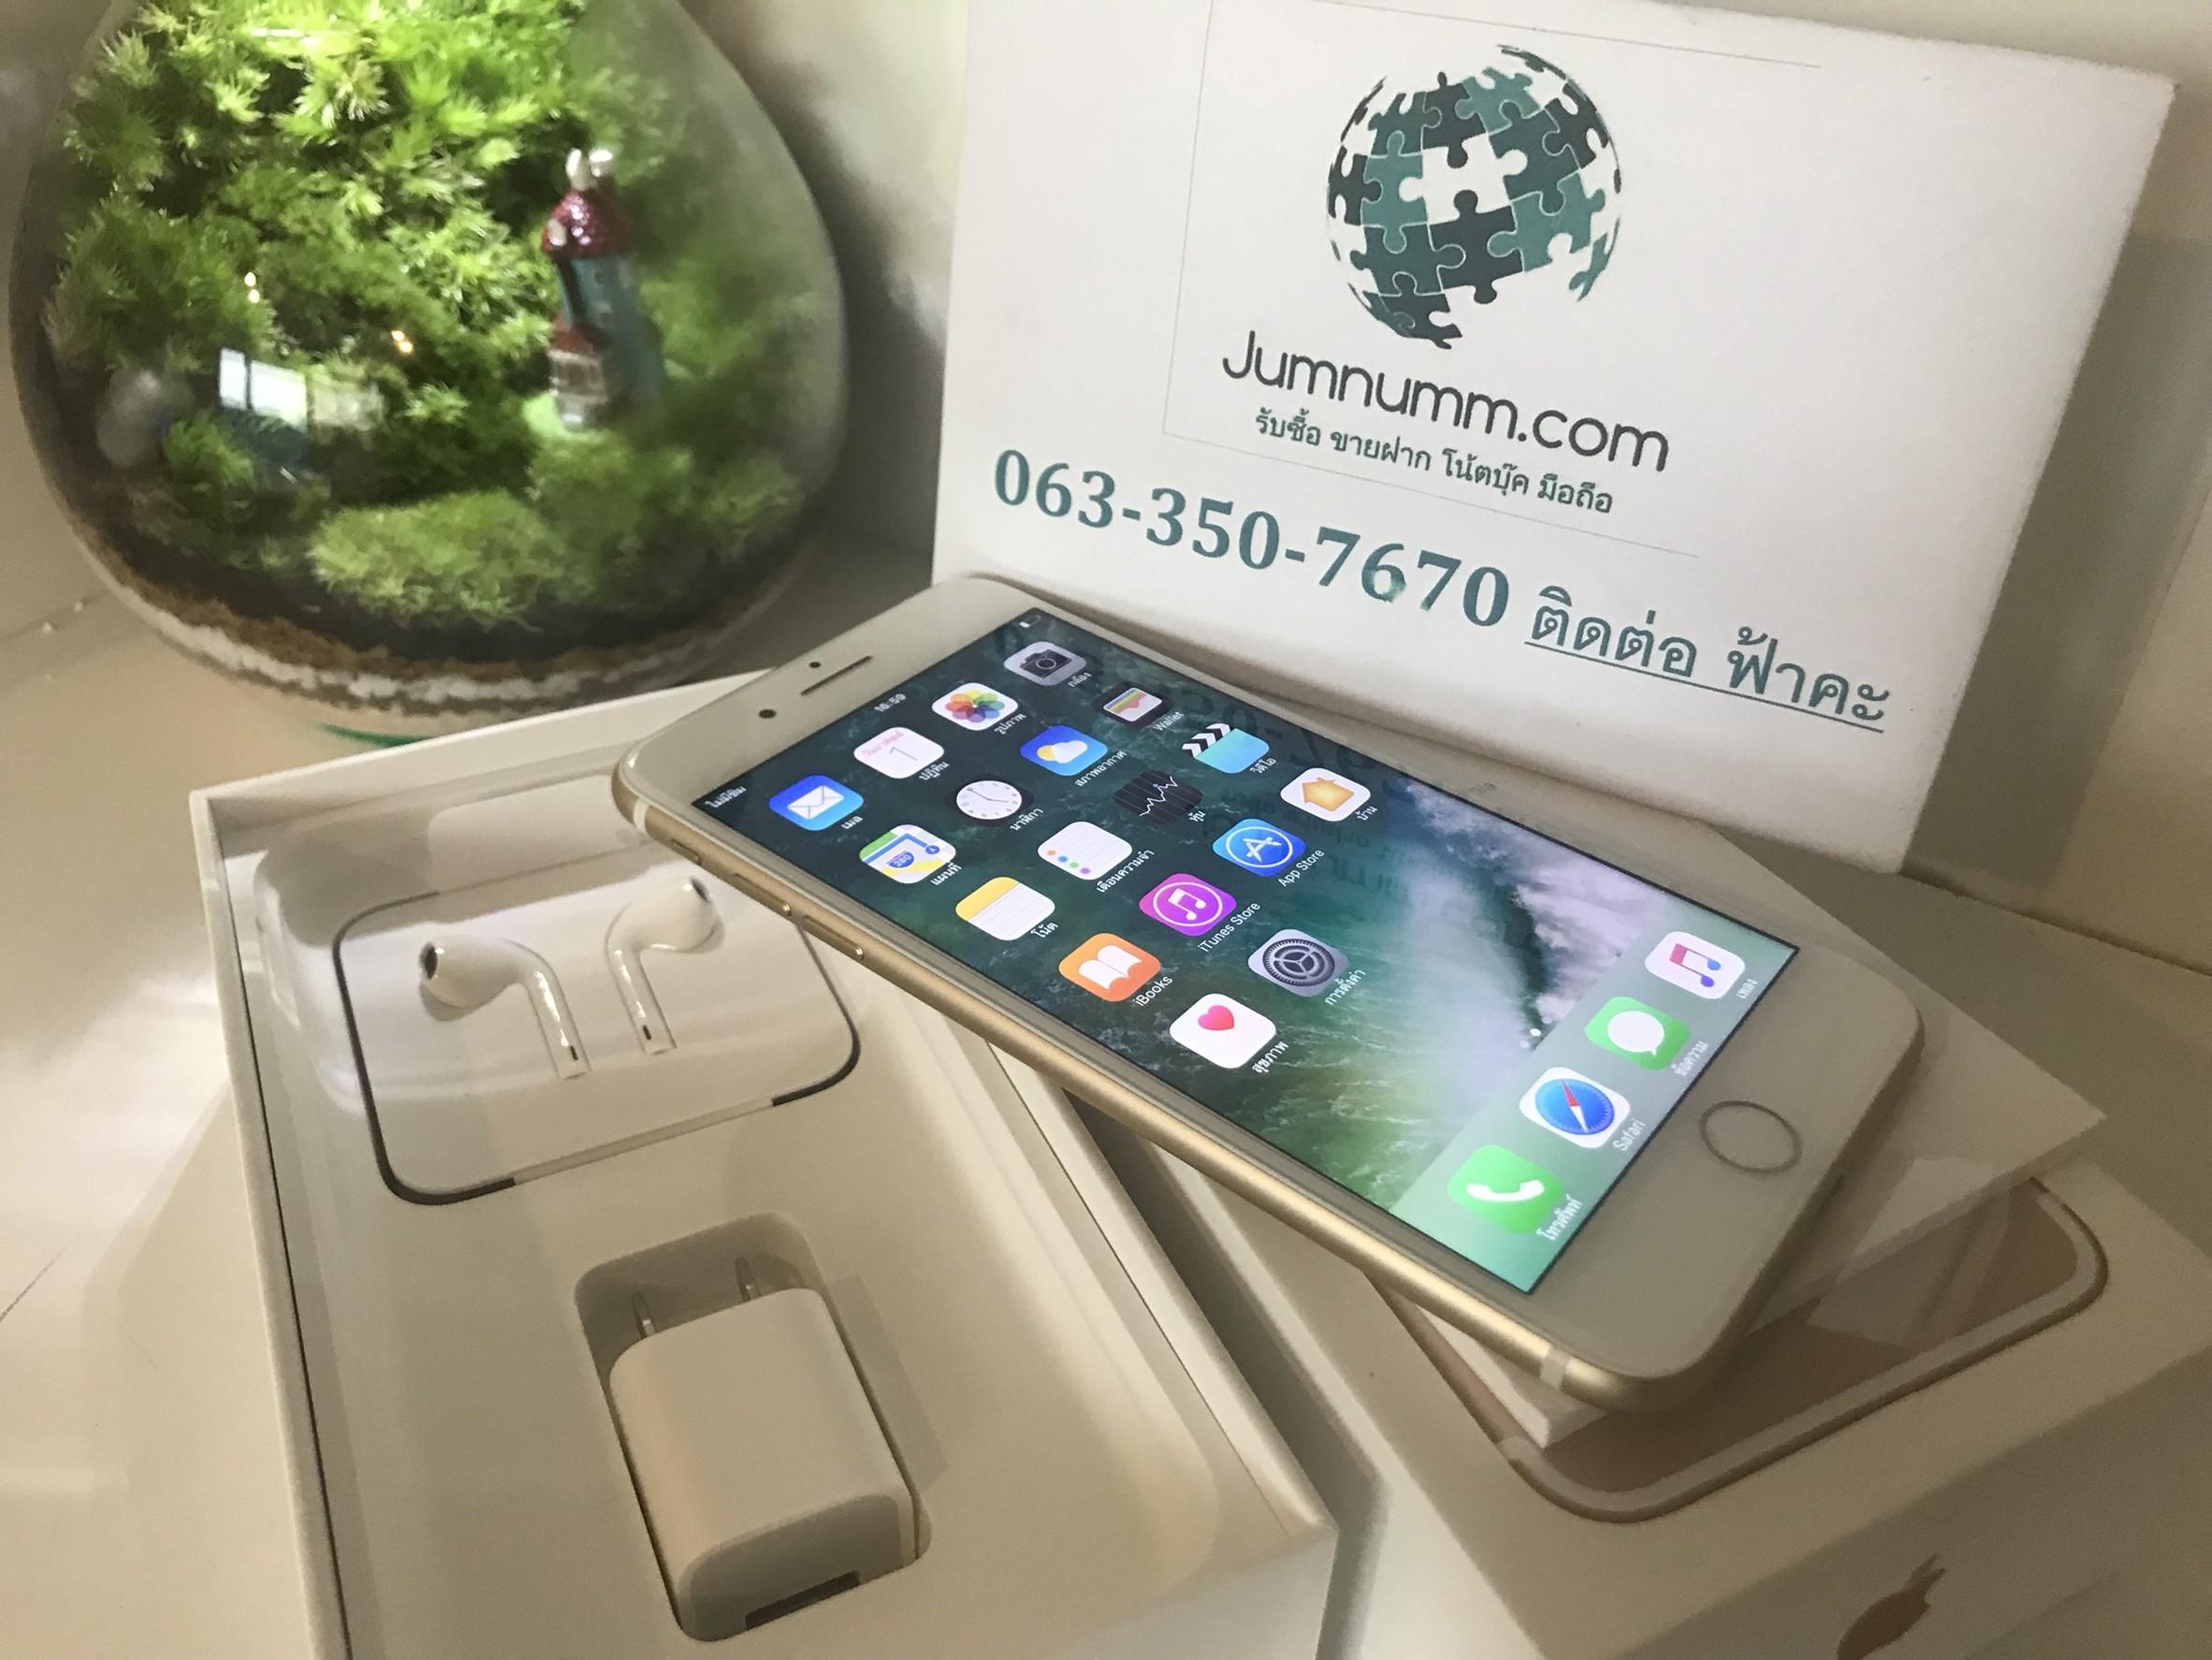 JMM-90 IPhone7 plus 32Gb Gold ประกันหมด ธ.ค 60